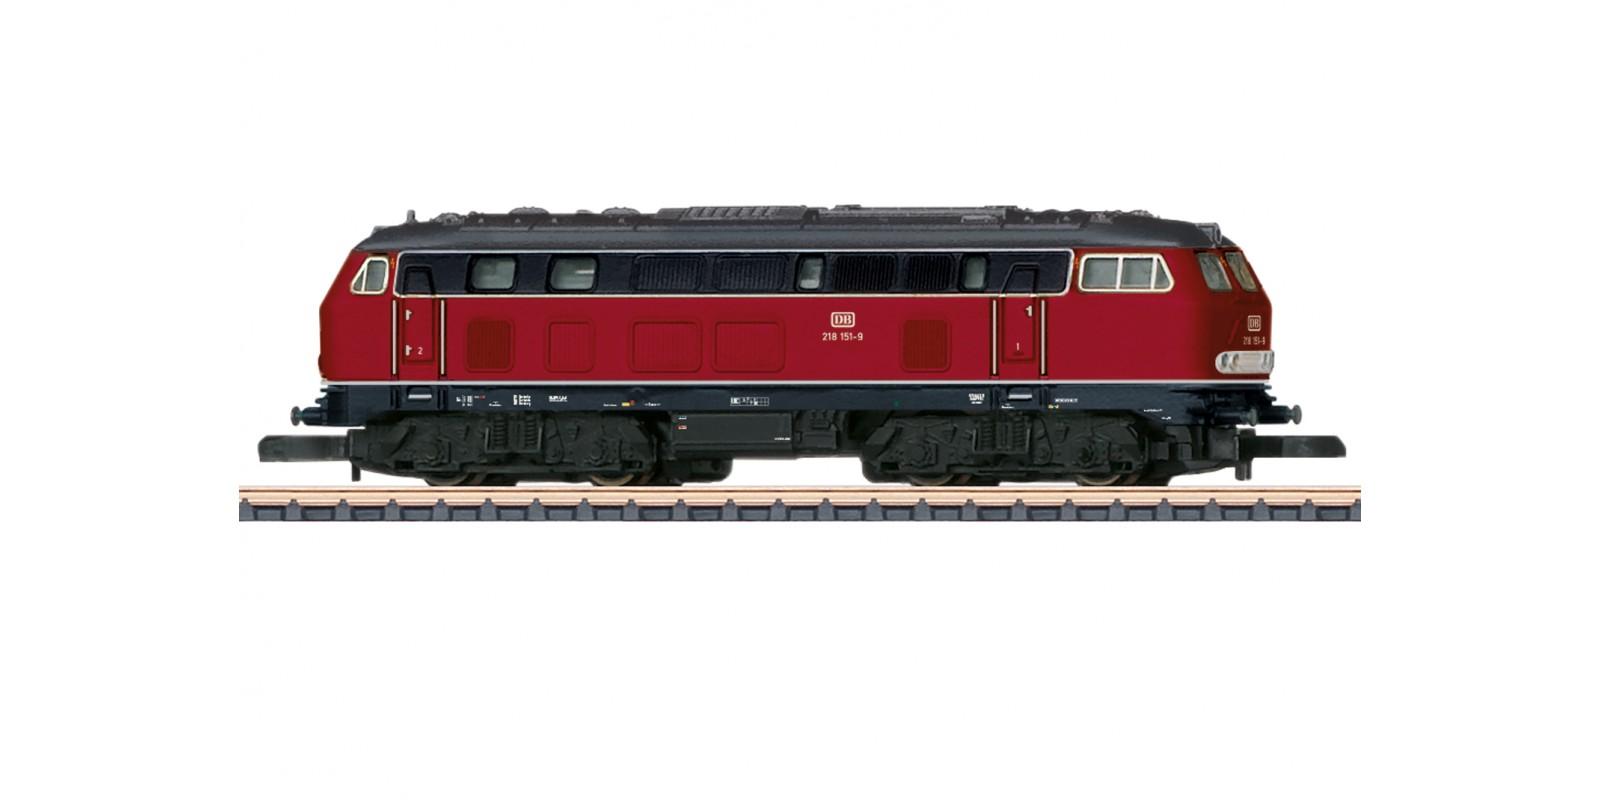 088792 Class 218 Diesel Locomotive